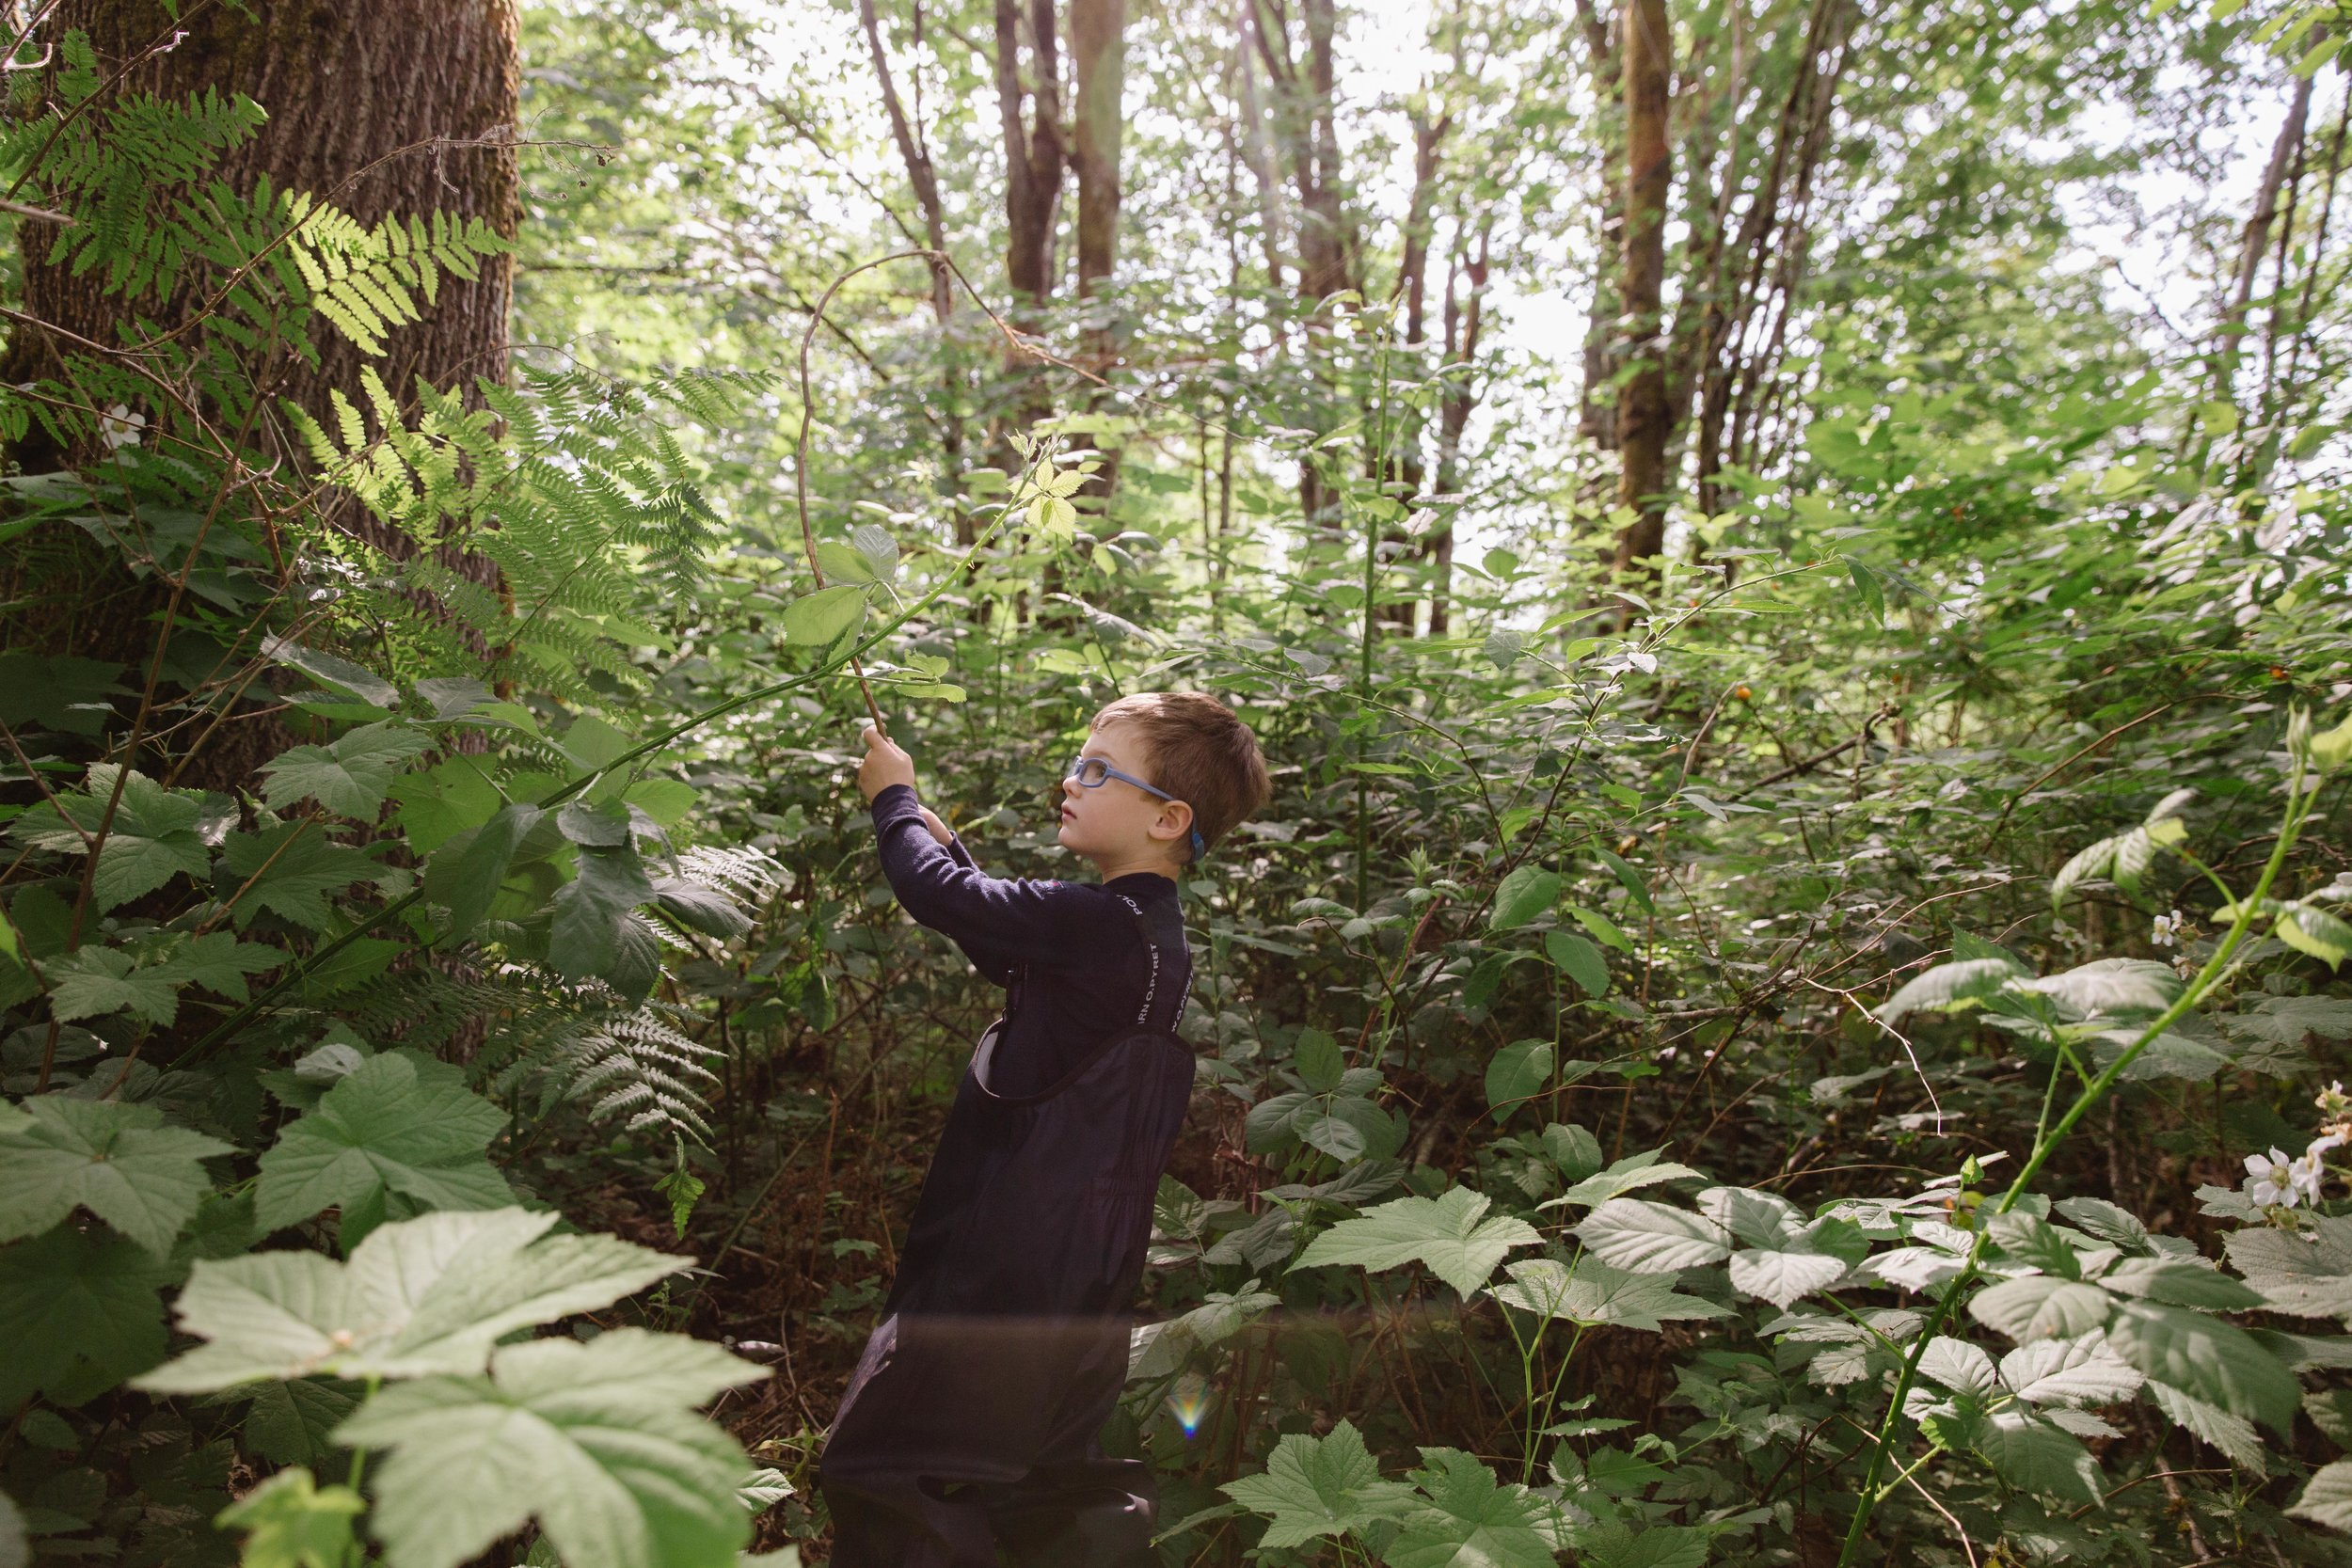 Sienna-Renee-Photography-Nature-Nuts-5408.jpg